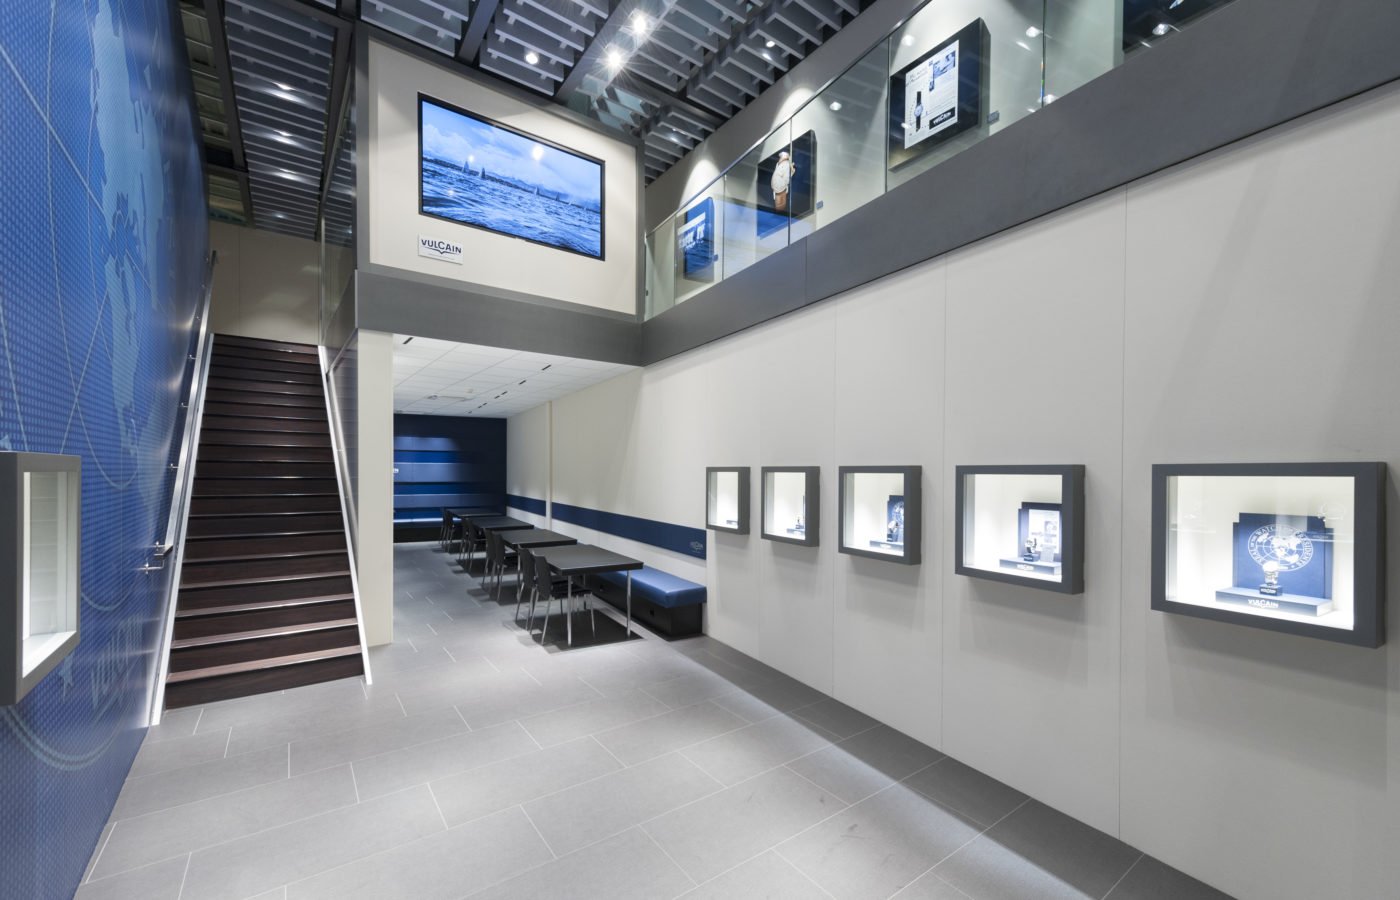 bollinger-architektur-basel-world-vulcain-jaermann-und-stuebi-31